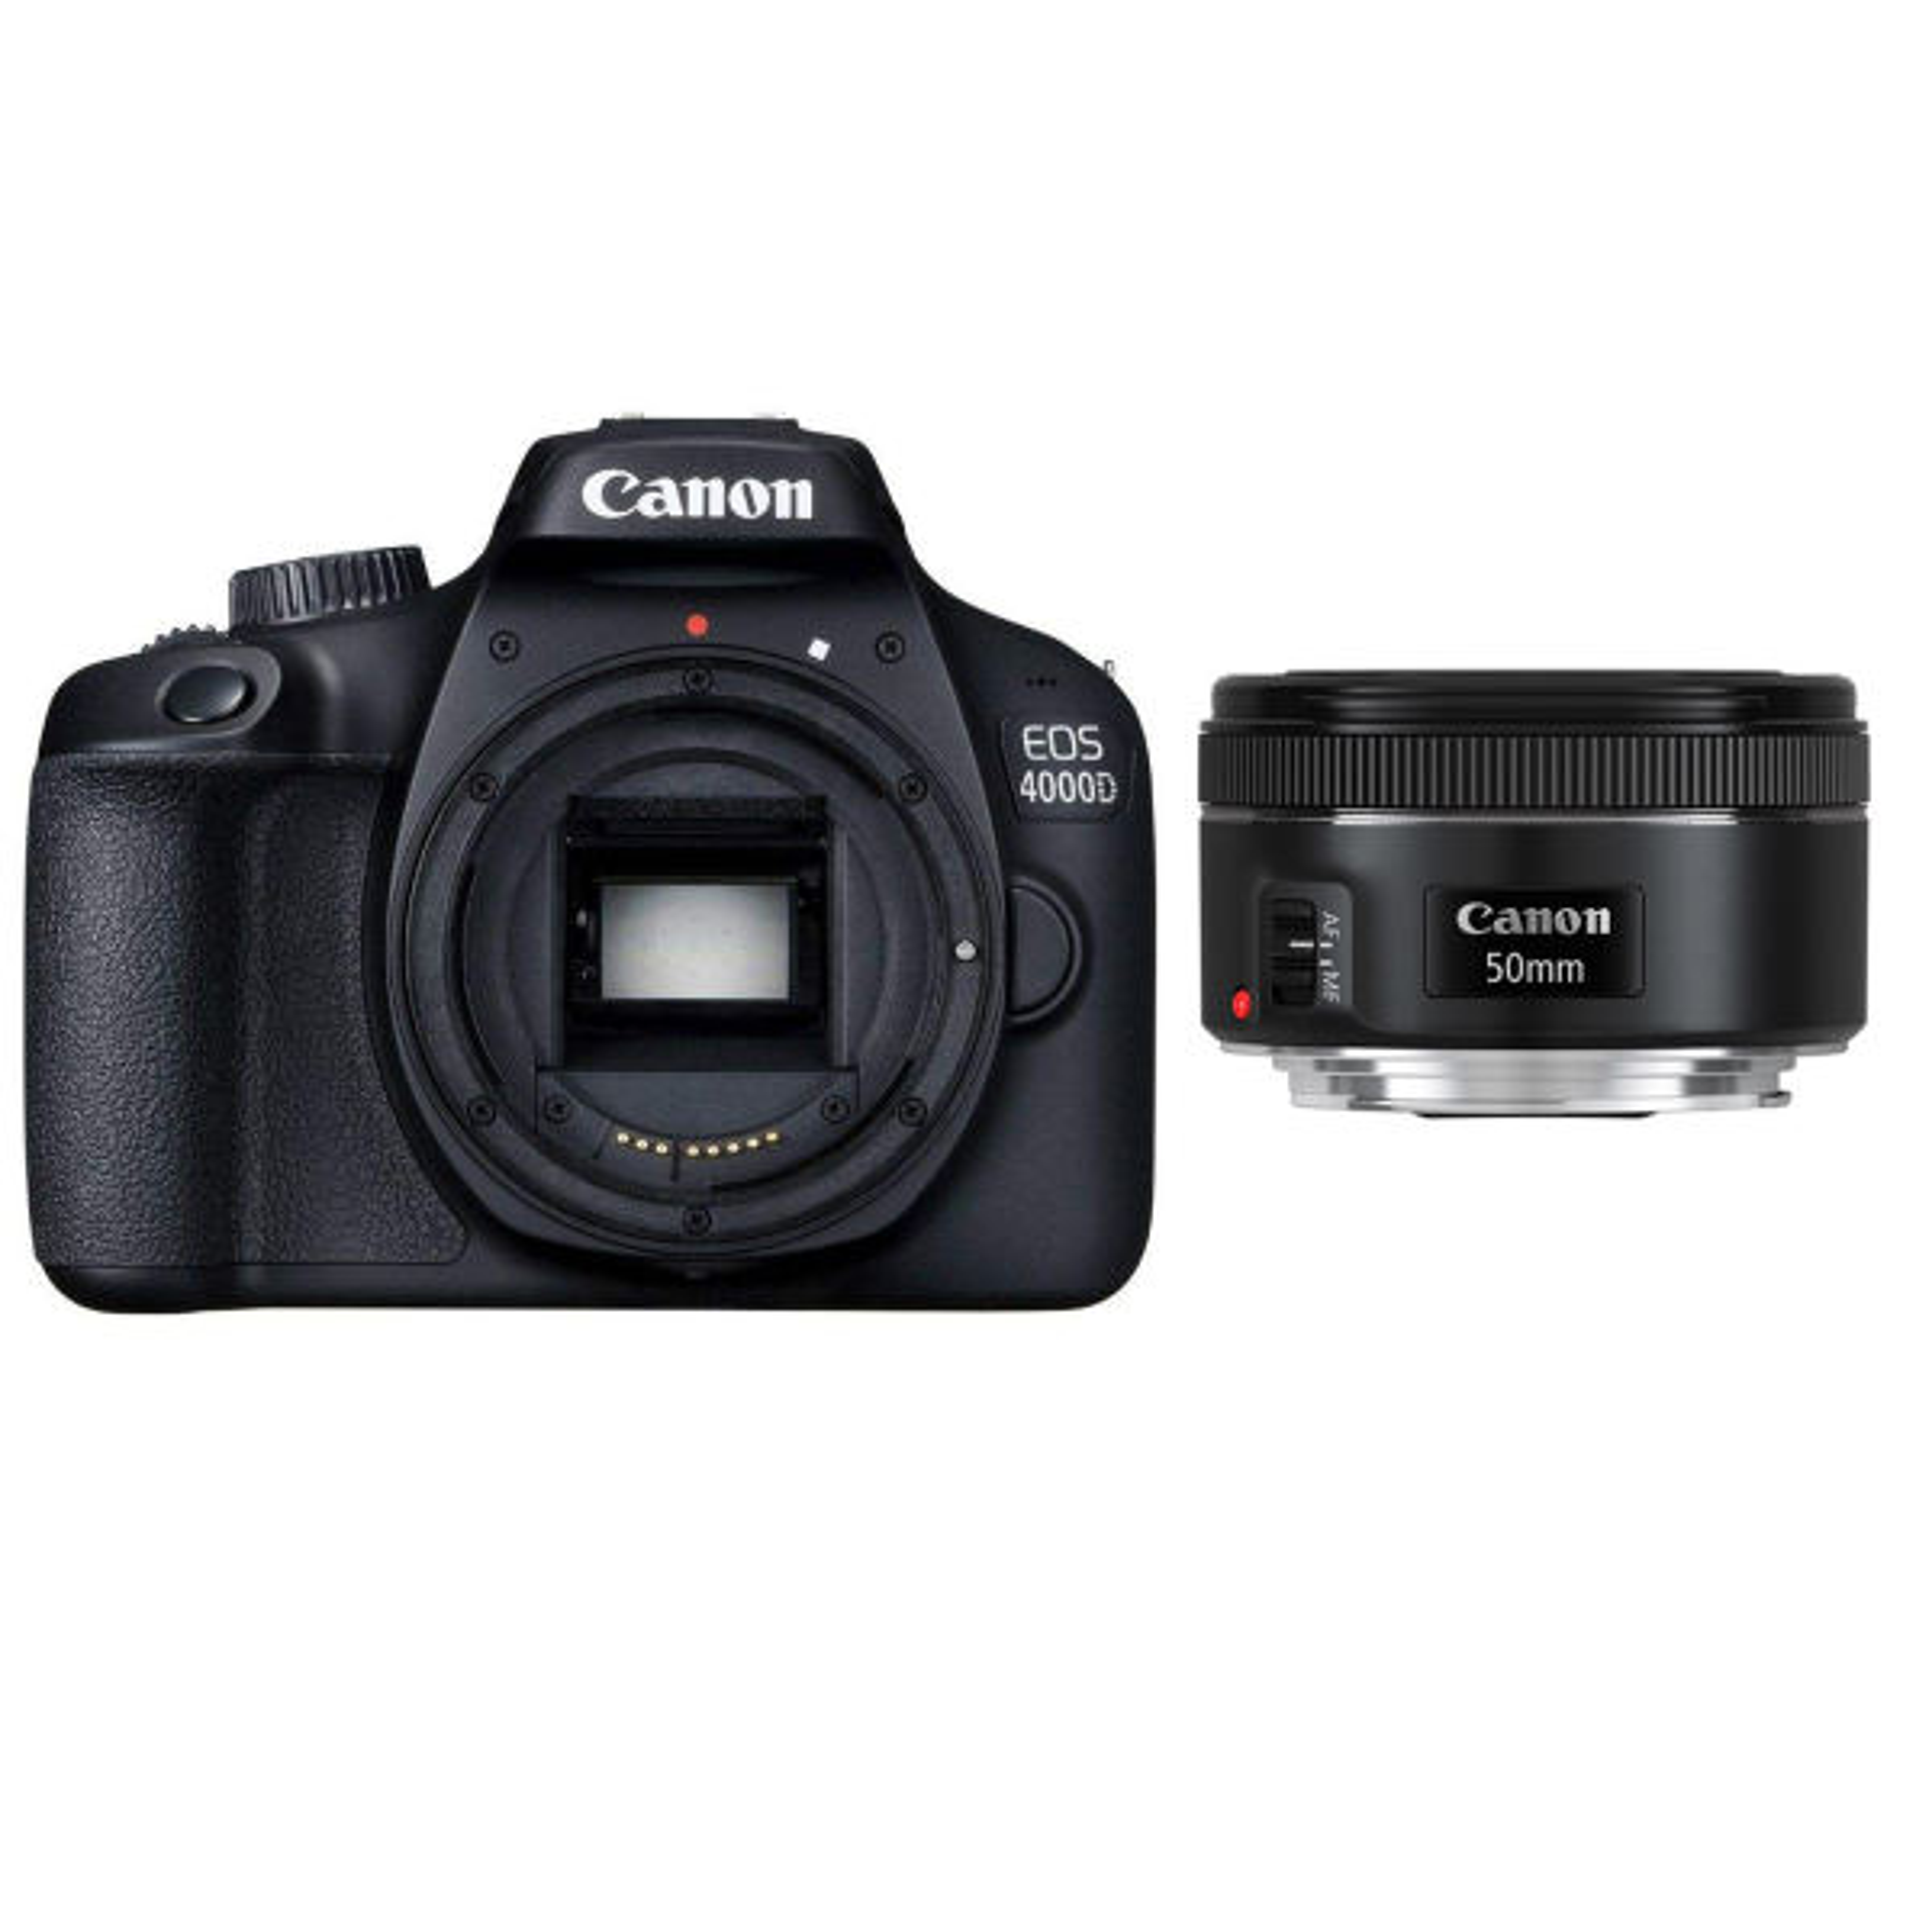 دوربین دیجیتال کانن مدل EOS 4000D به همراه لنز 50 میلی متر STM